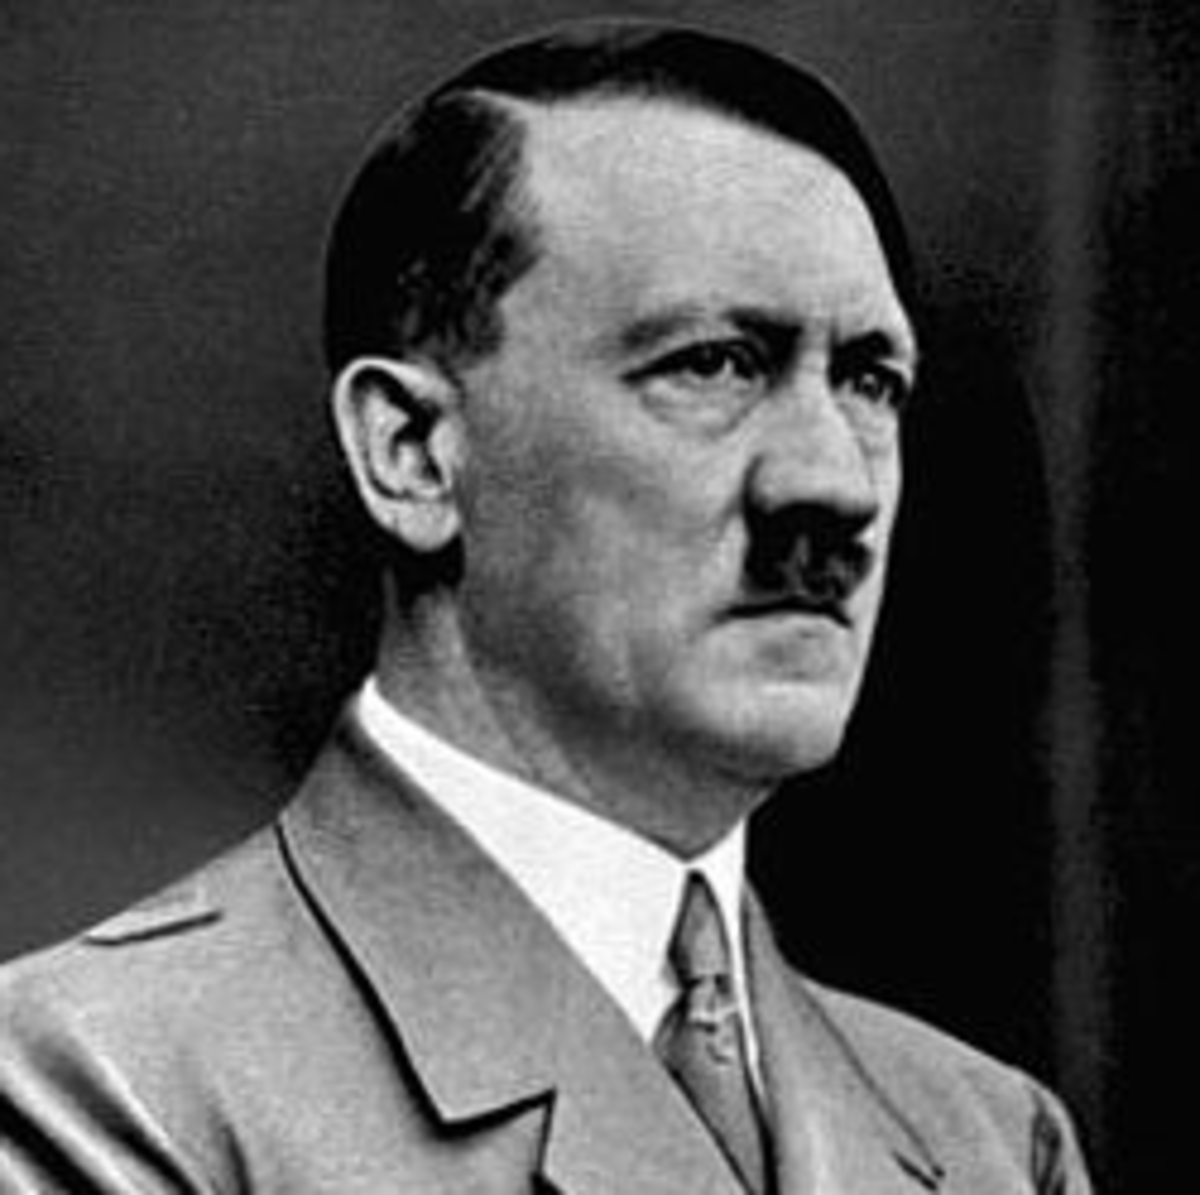 hitler-unity-mitford-illegitimate-child